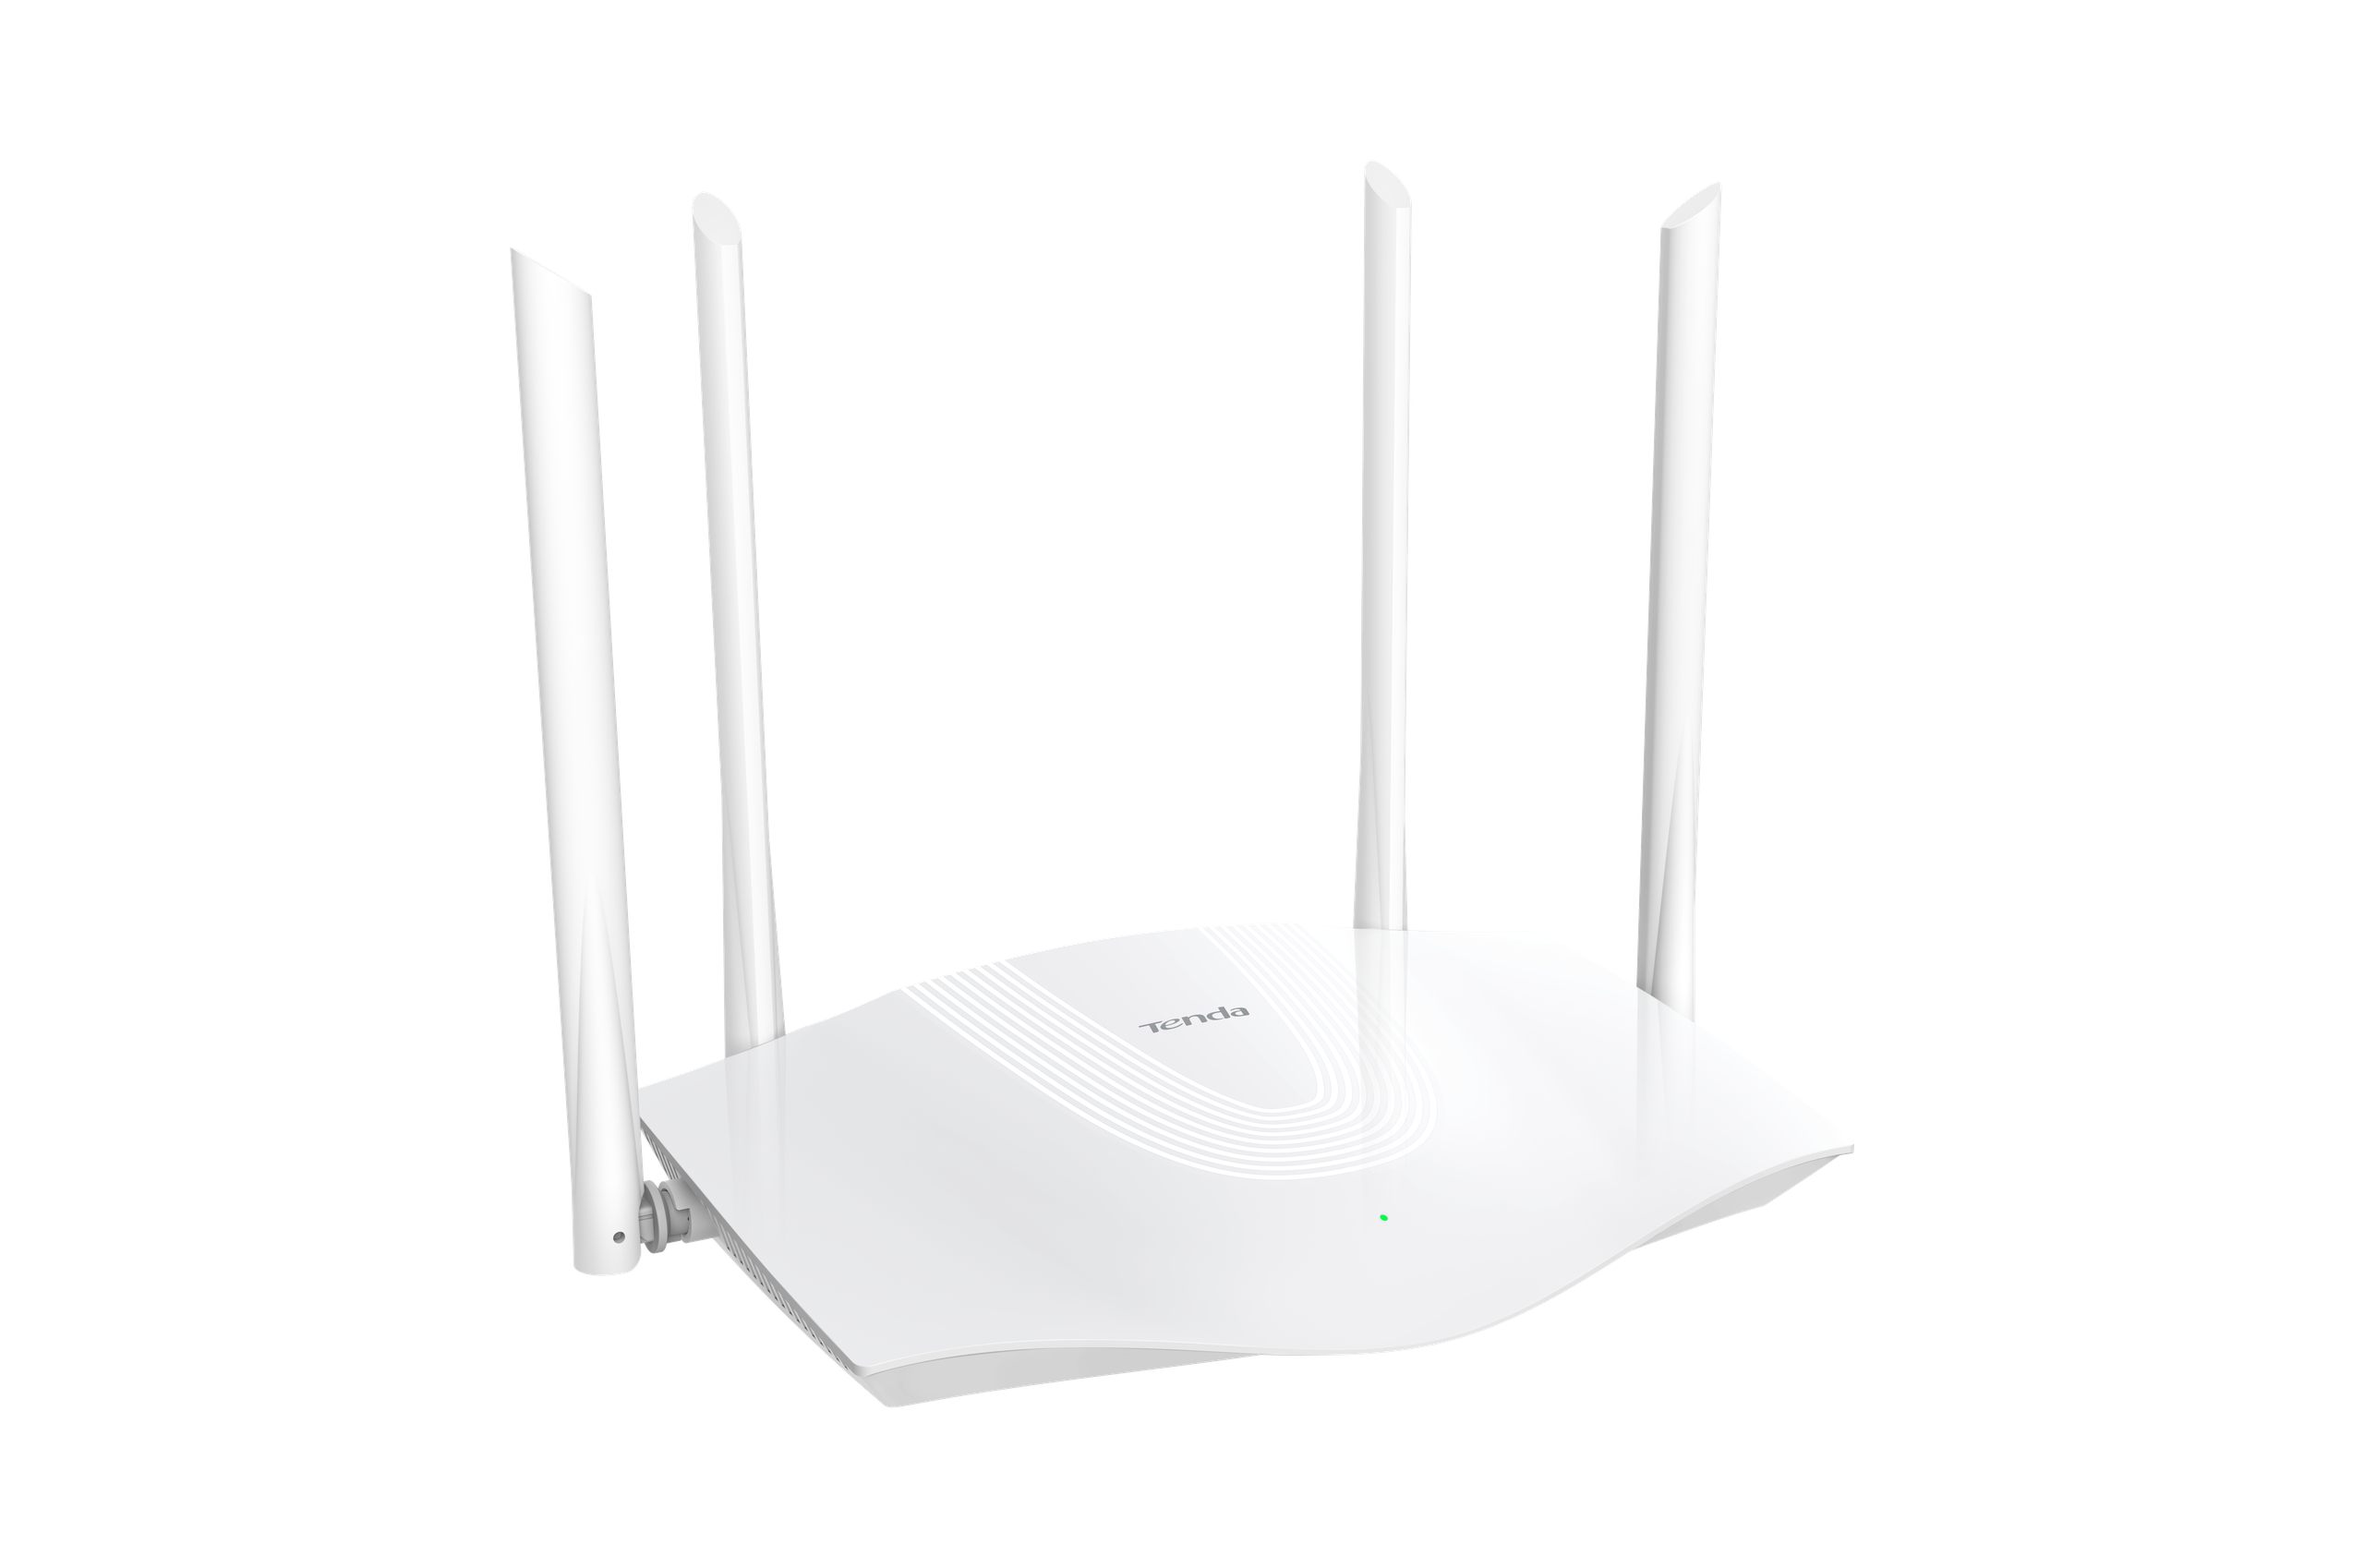 Dwupasmowy, gigabitowy router WiFi 6 AX1800